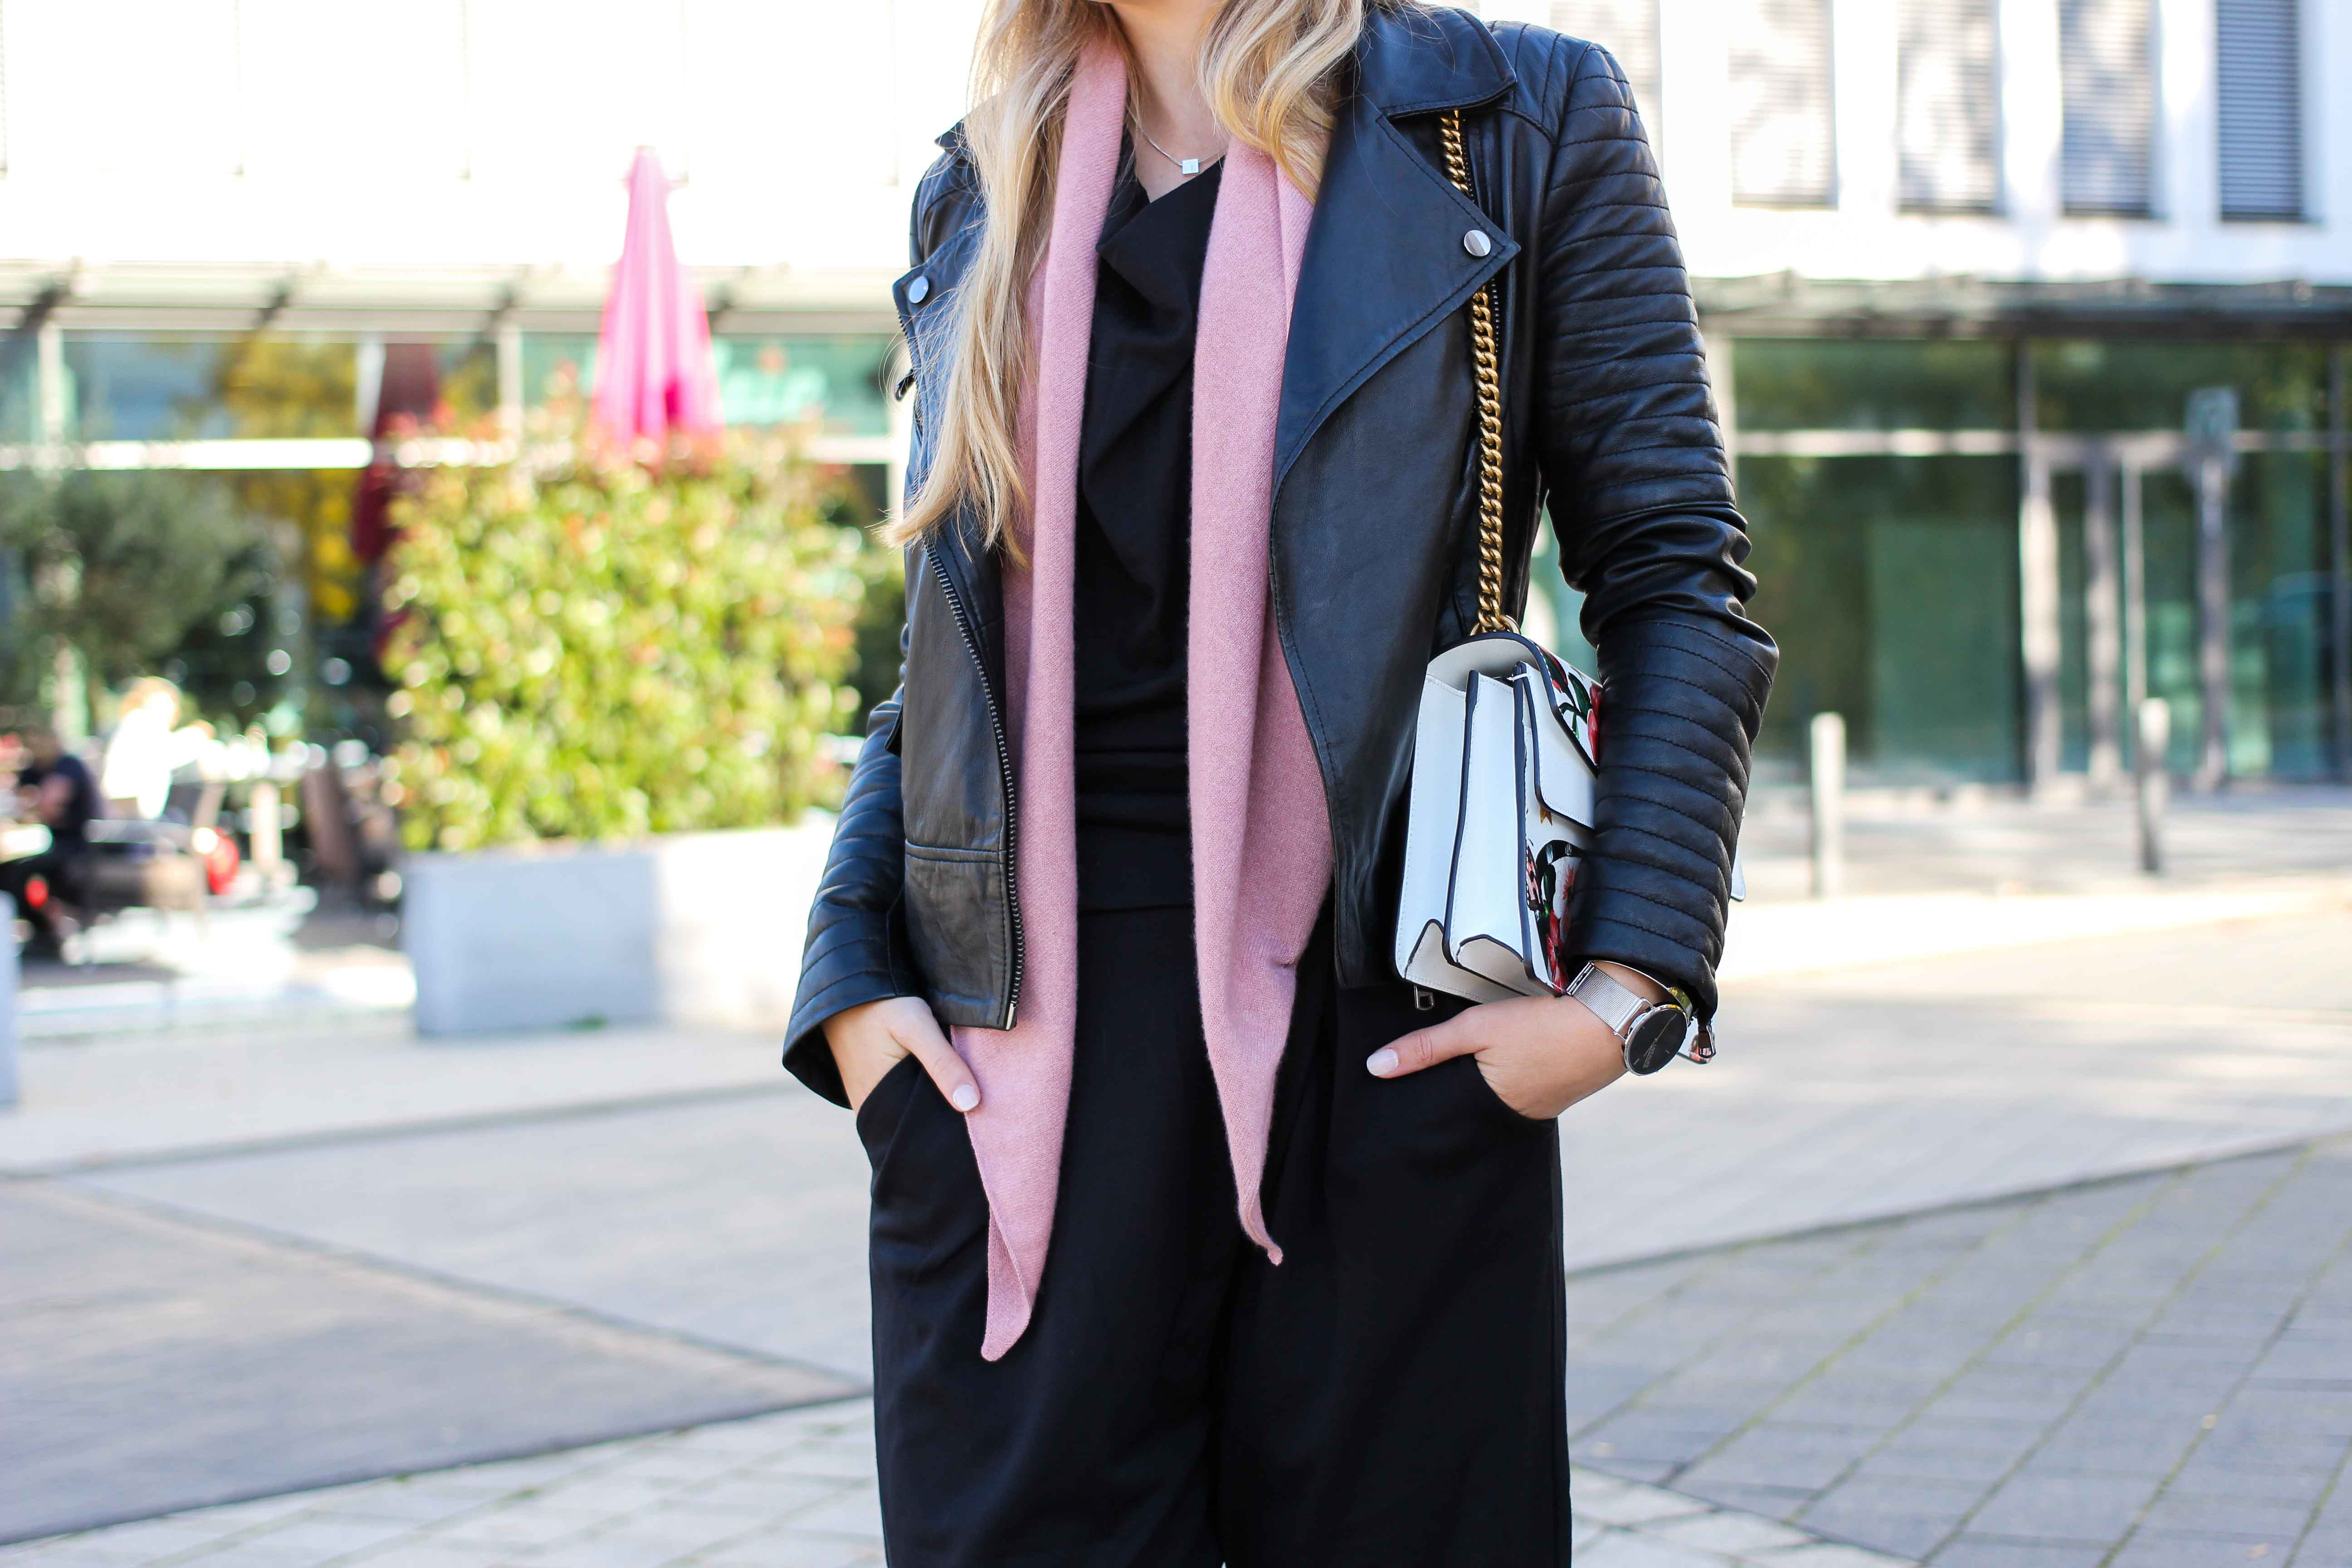 Schwarzer Jumpsuit rosa Kaschmir Schal Gucci Dionysus Designertasche Lederjacke Modeblog Herbsttrend 7